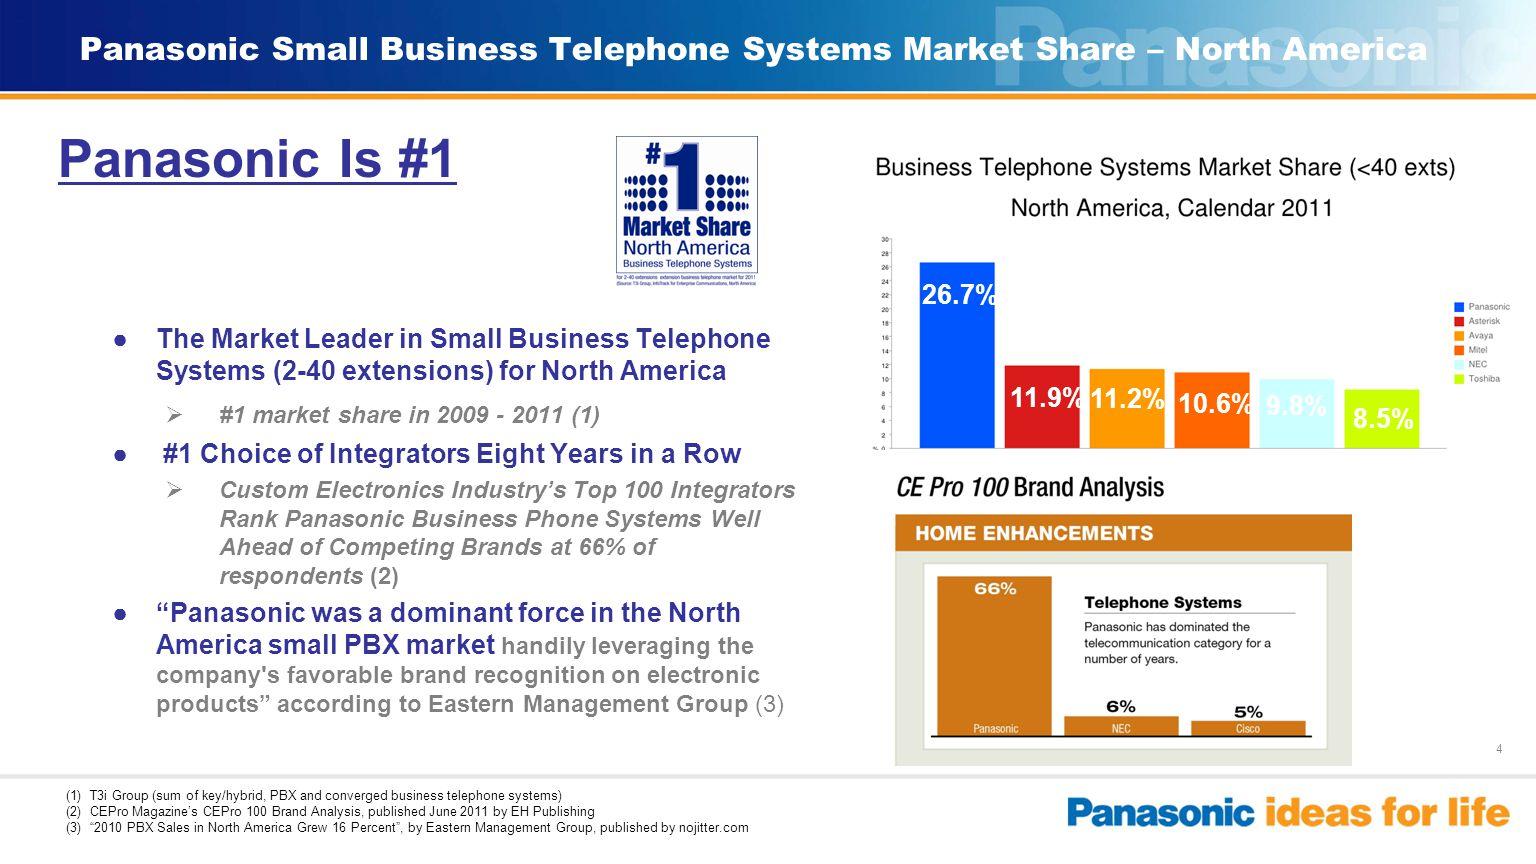 4 Panasonic Small Business Telephone Systems Market Share – North America Panasonic Is #1 The Market Leader in Small Business Telephone Systems (2-40